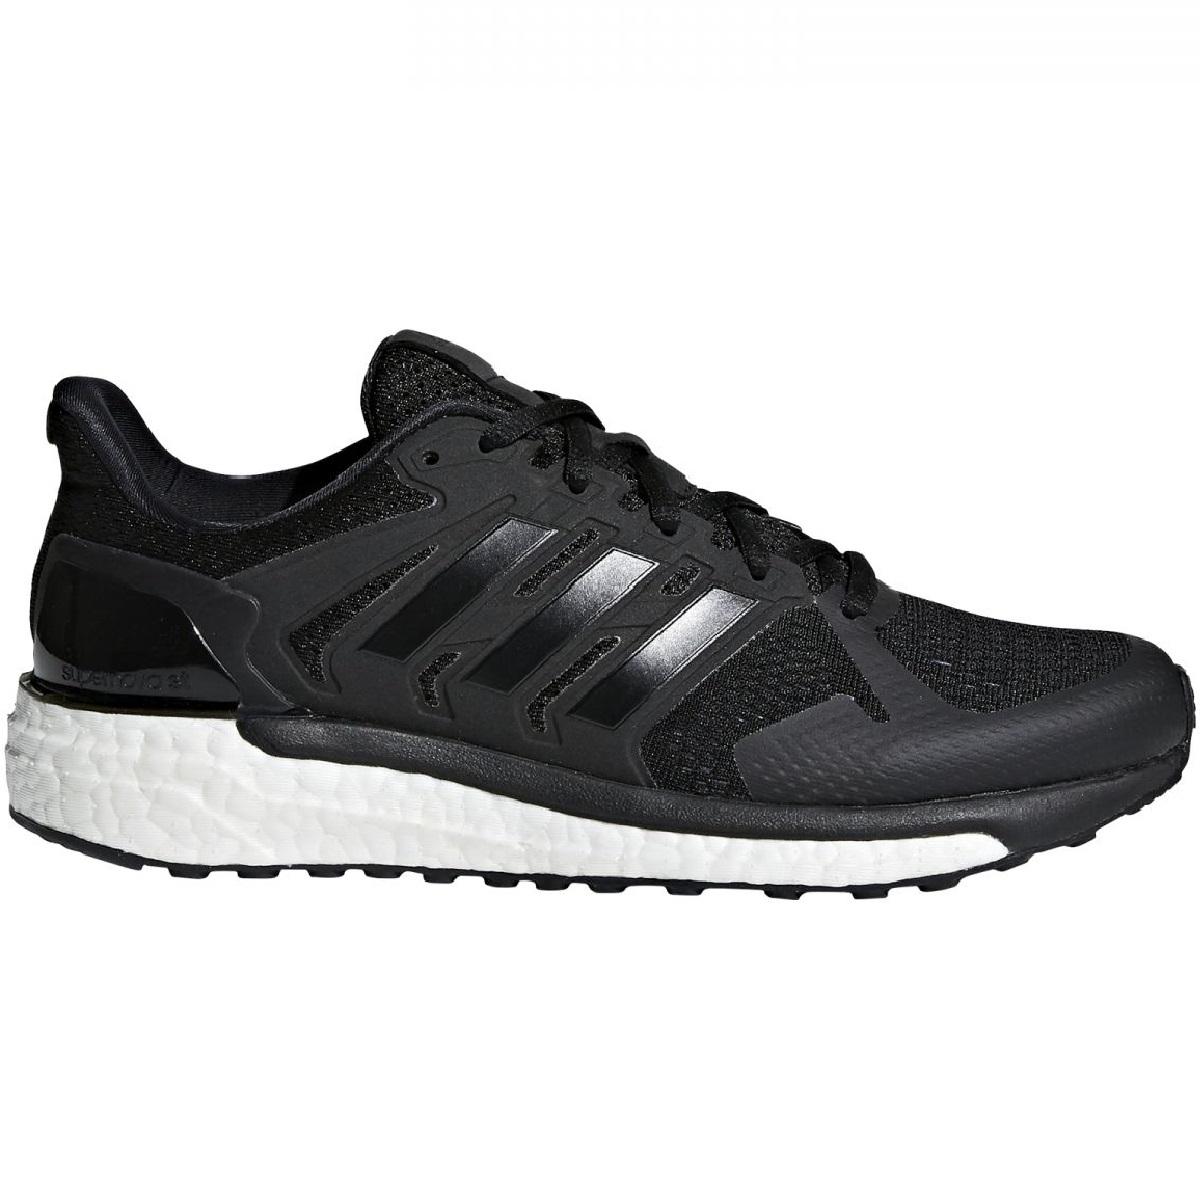 pretty nice 6cea8 f0907 adidas Supernova St Damen Laufschuhe Running schwarz weiß